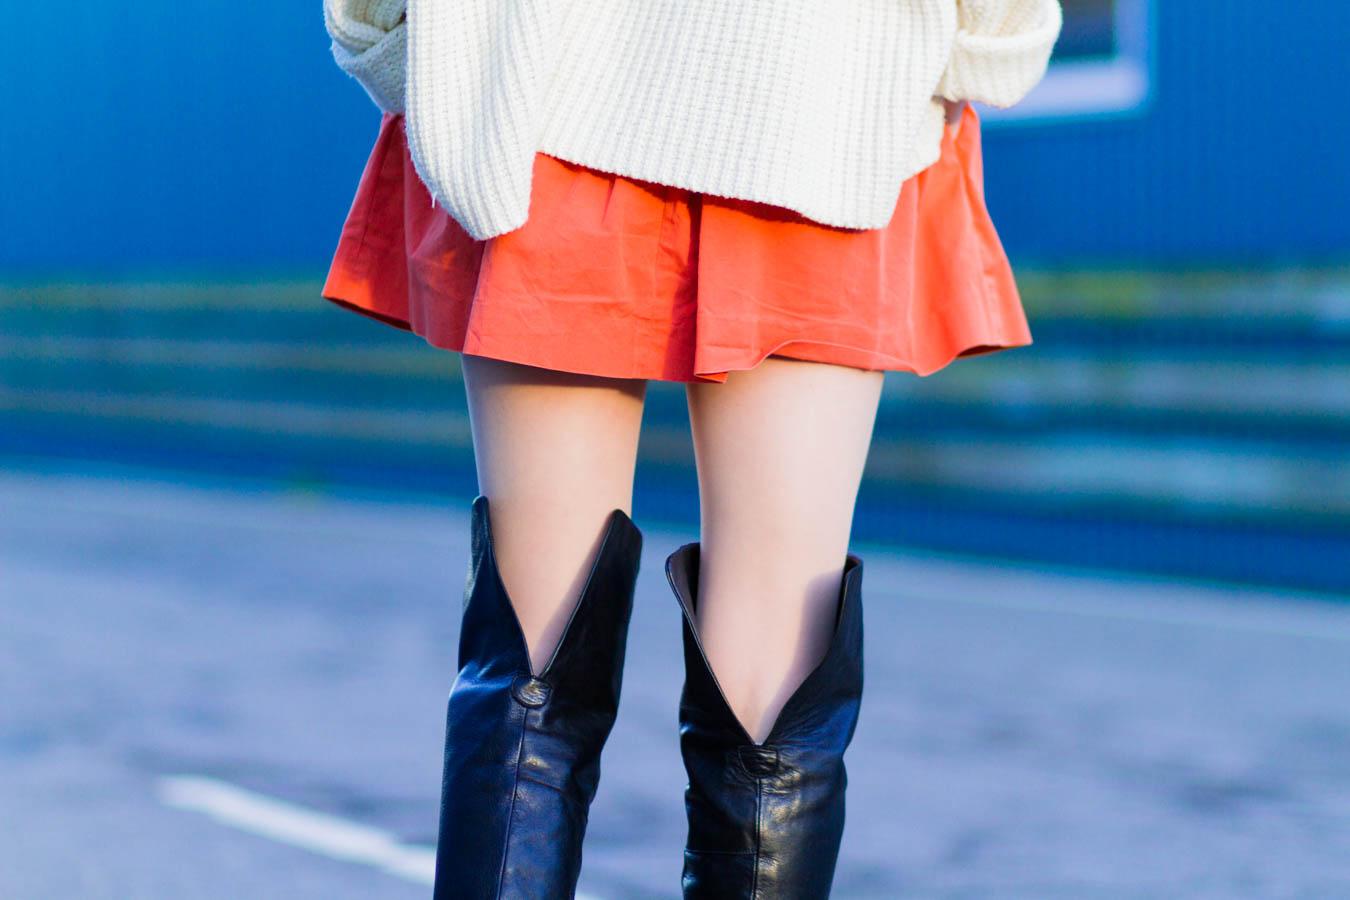 outfit december nemesis babe marie jensen danish blogger thigh high boots sarenza zara orange skirt vintage sweater and beret-7